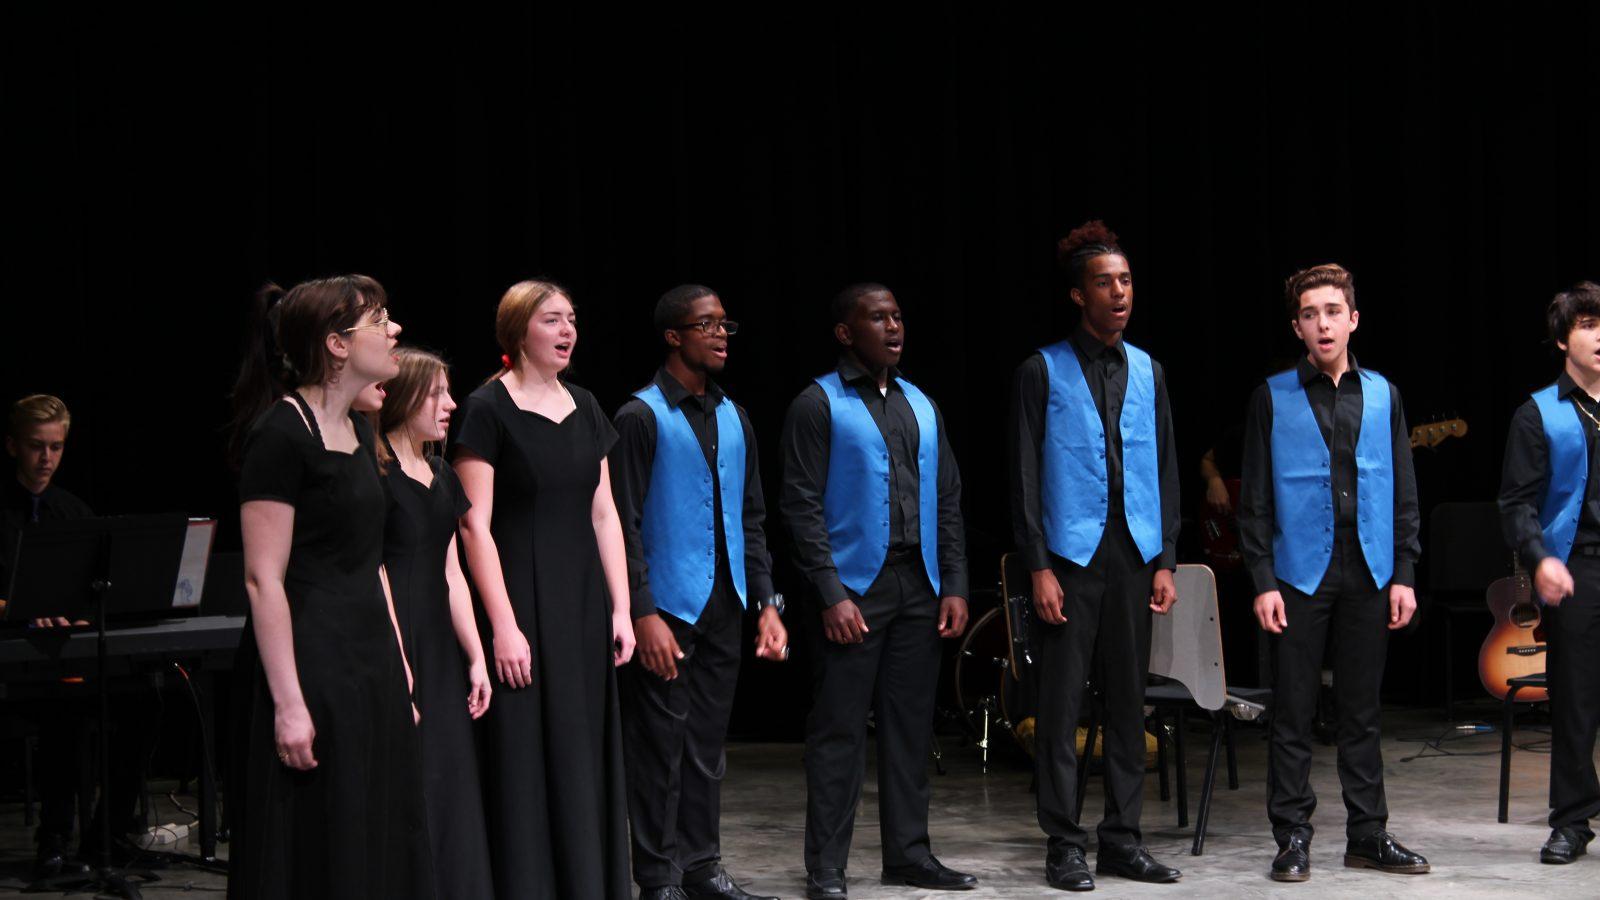 Chorus Students Performing at Preview Night